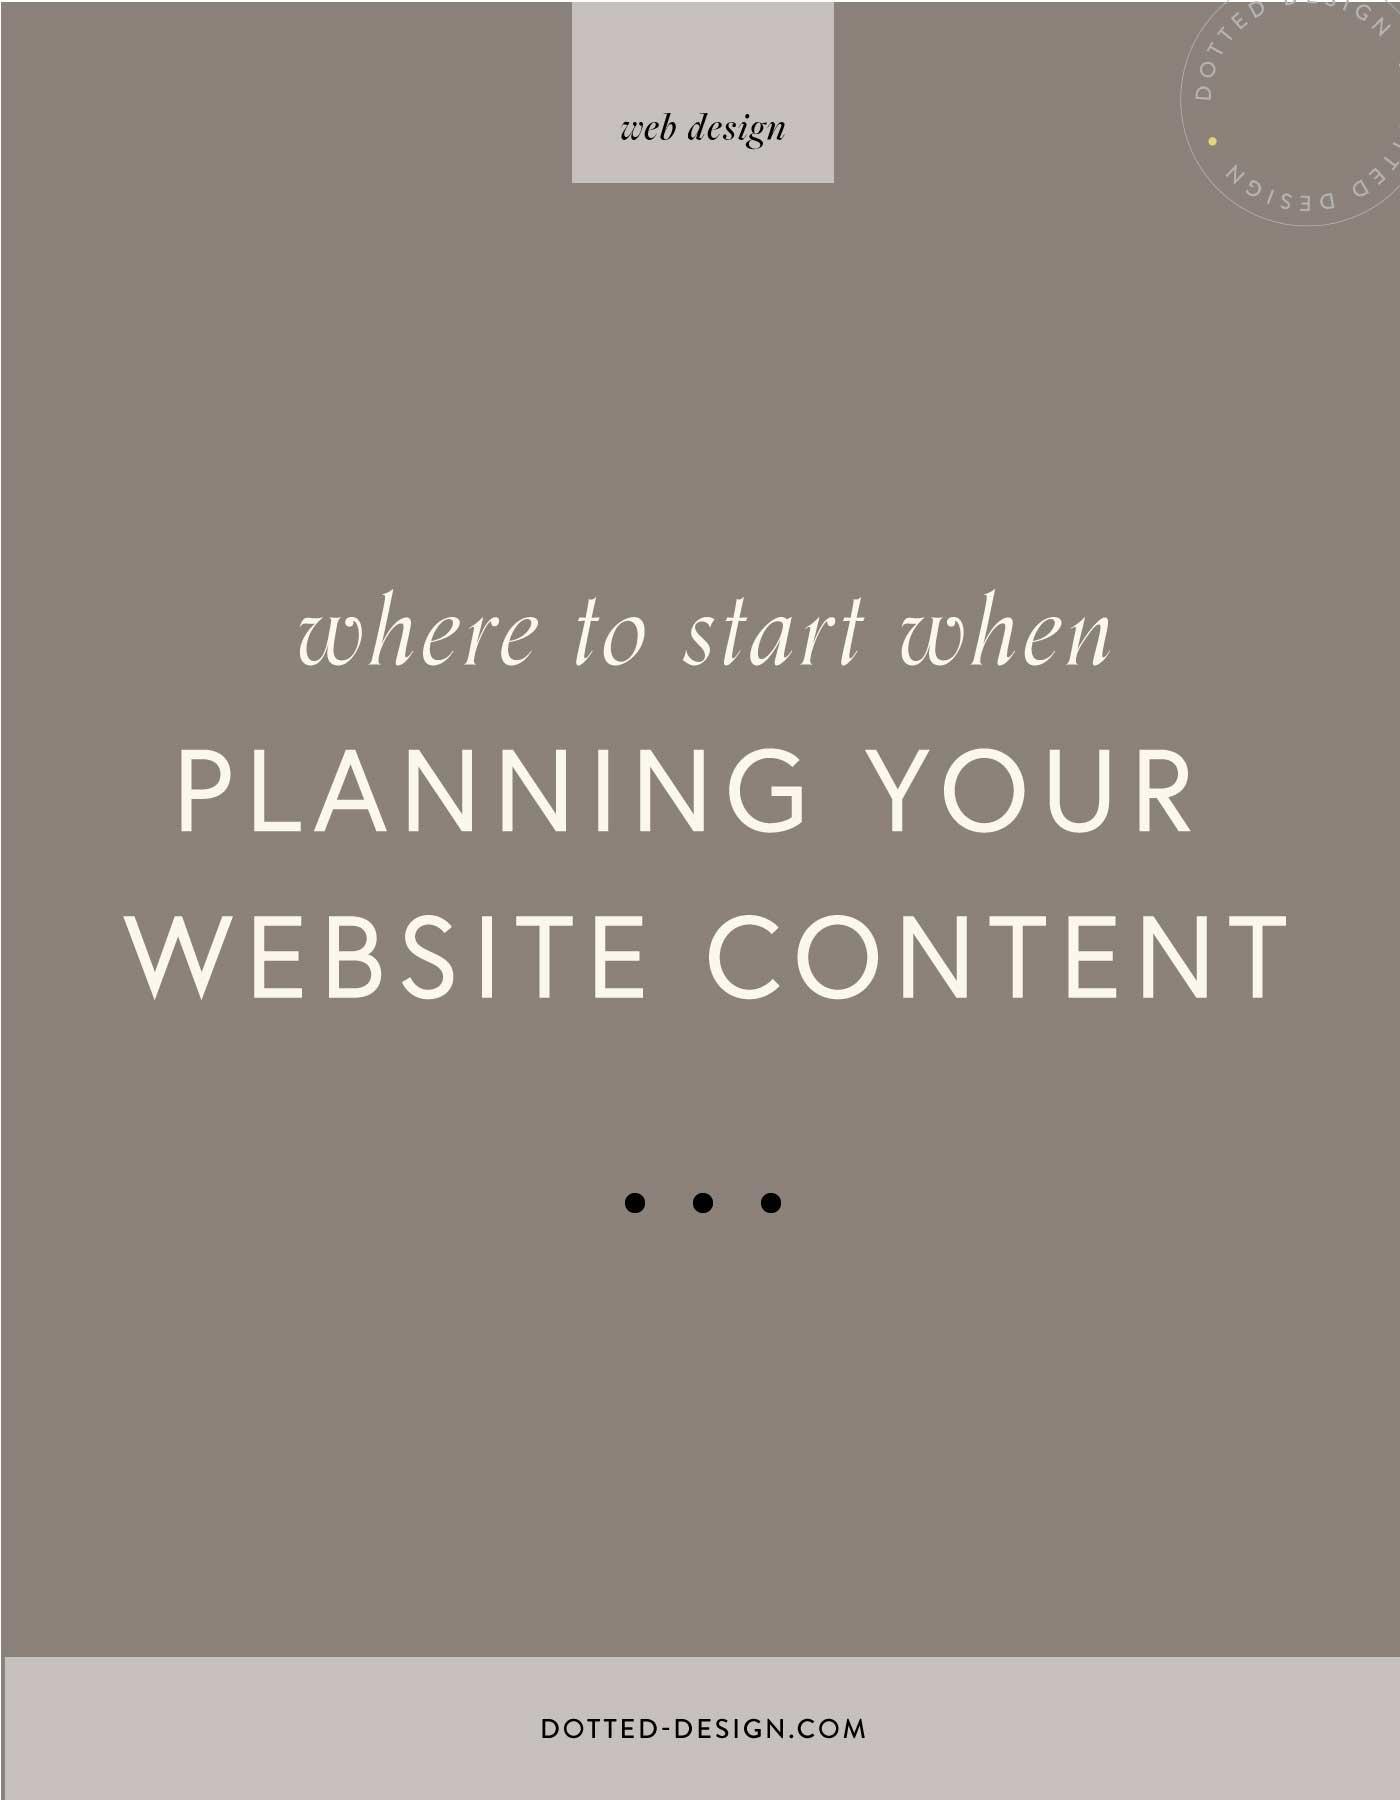 planning-website-content-dotted-design.jpg